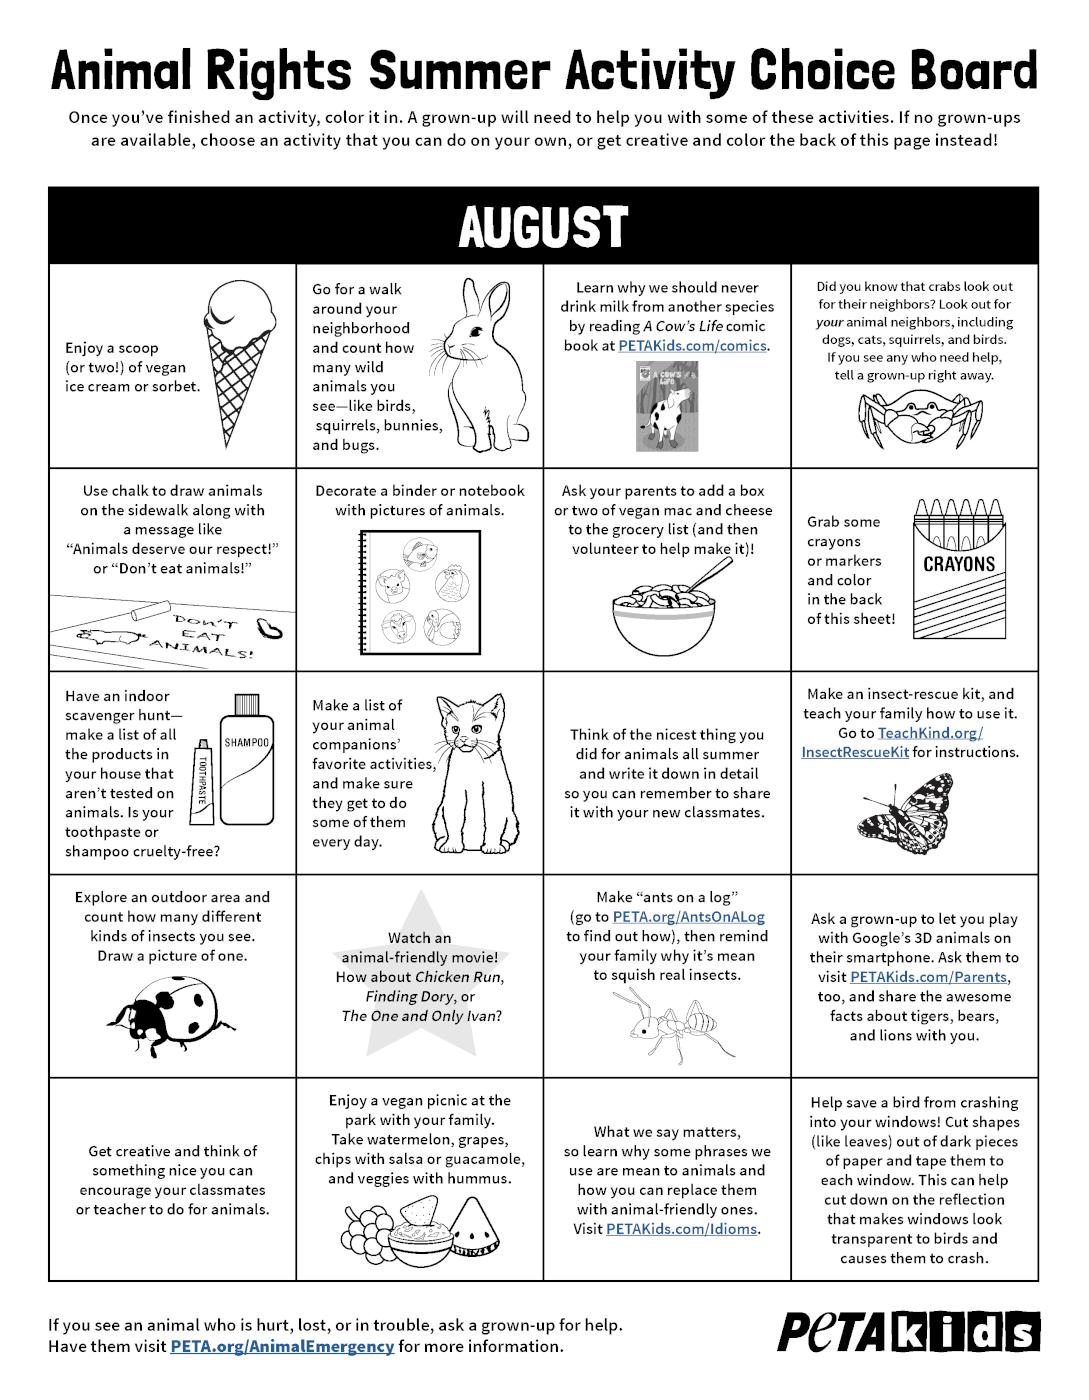 August summer activity choice board